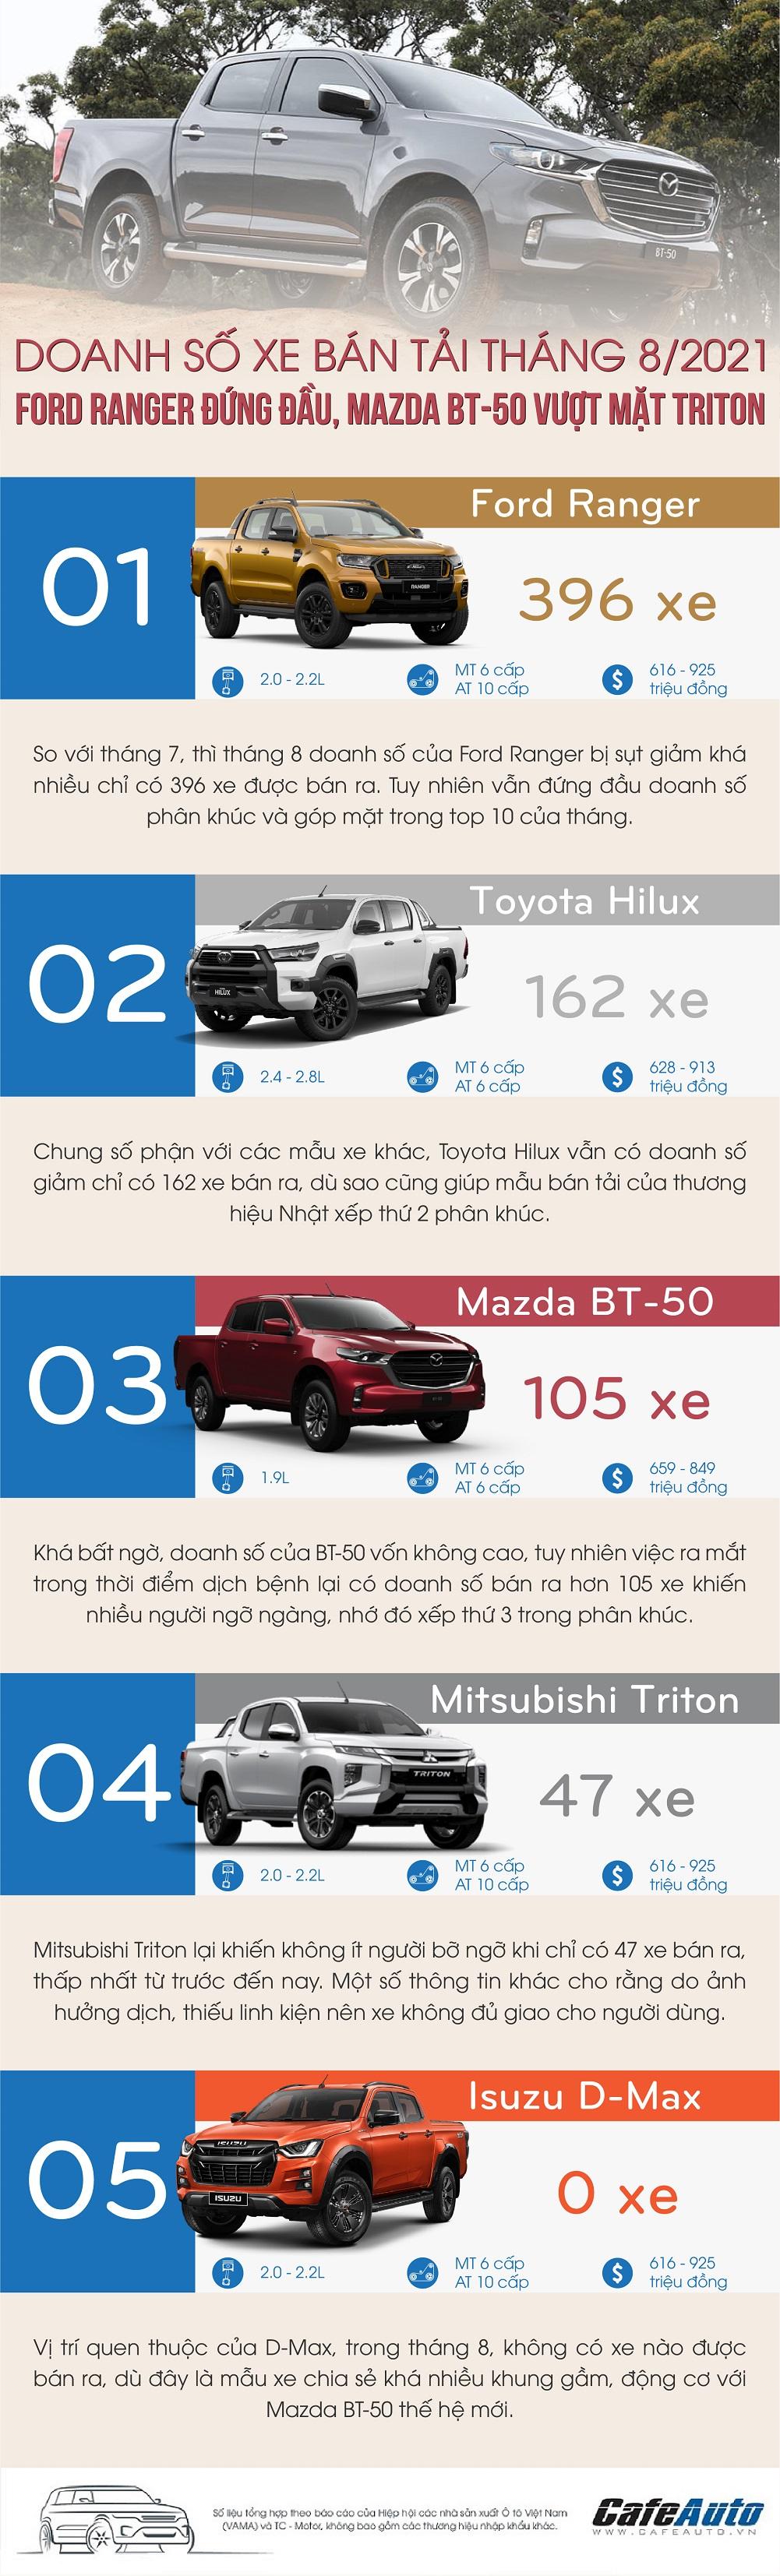 doanh-so-xe-ban-tai-thang-8-2021-ford-ranger-dung-dau-mazda-bt-50-vuot-mat-triton